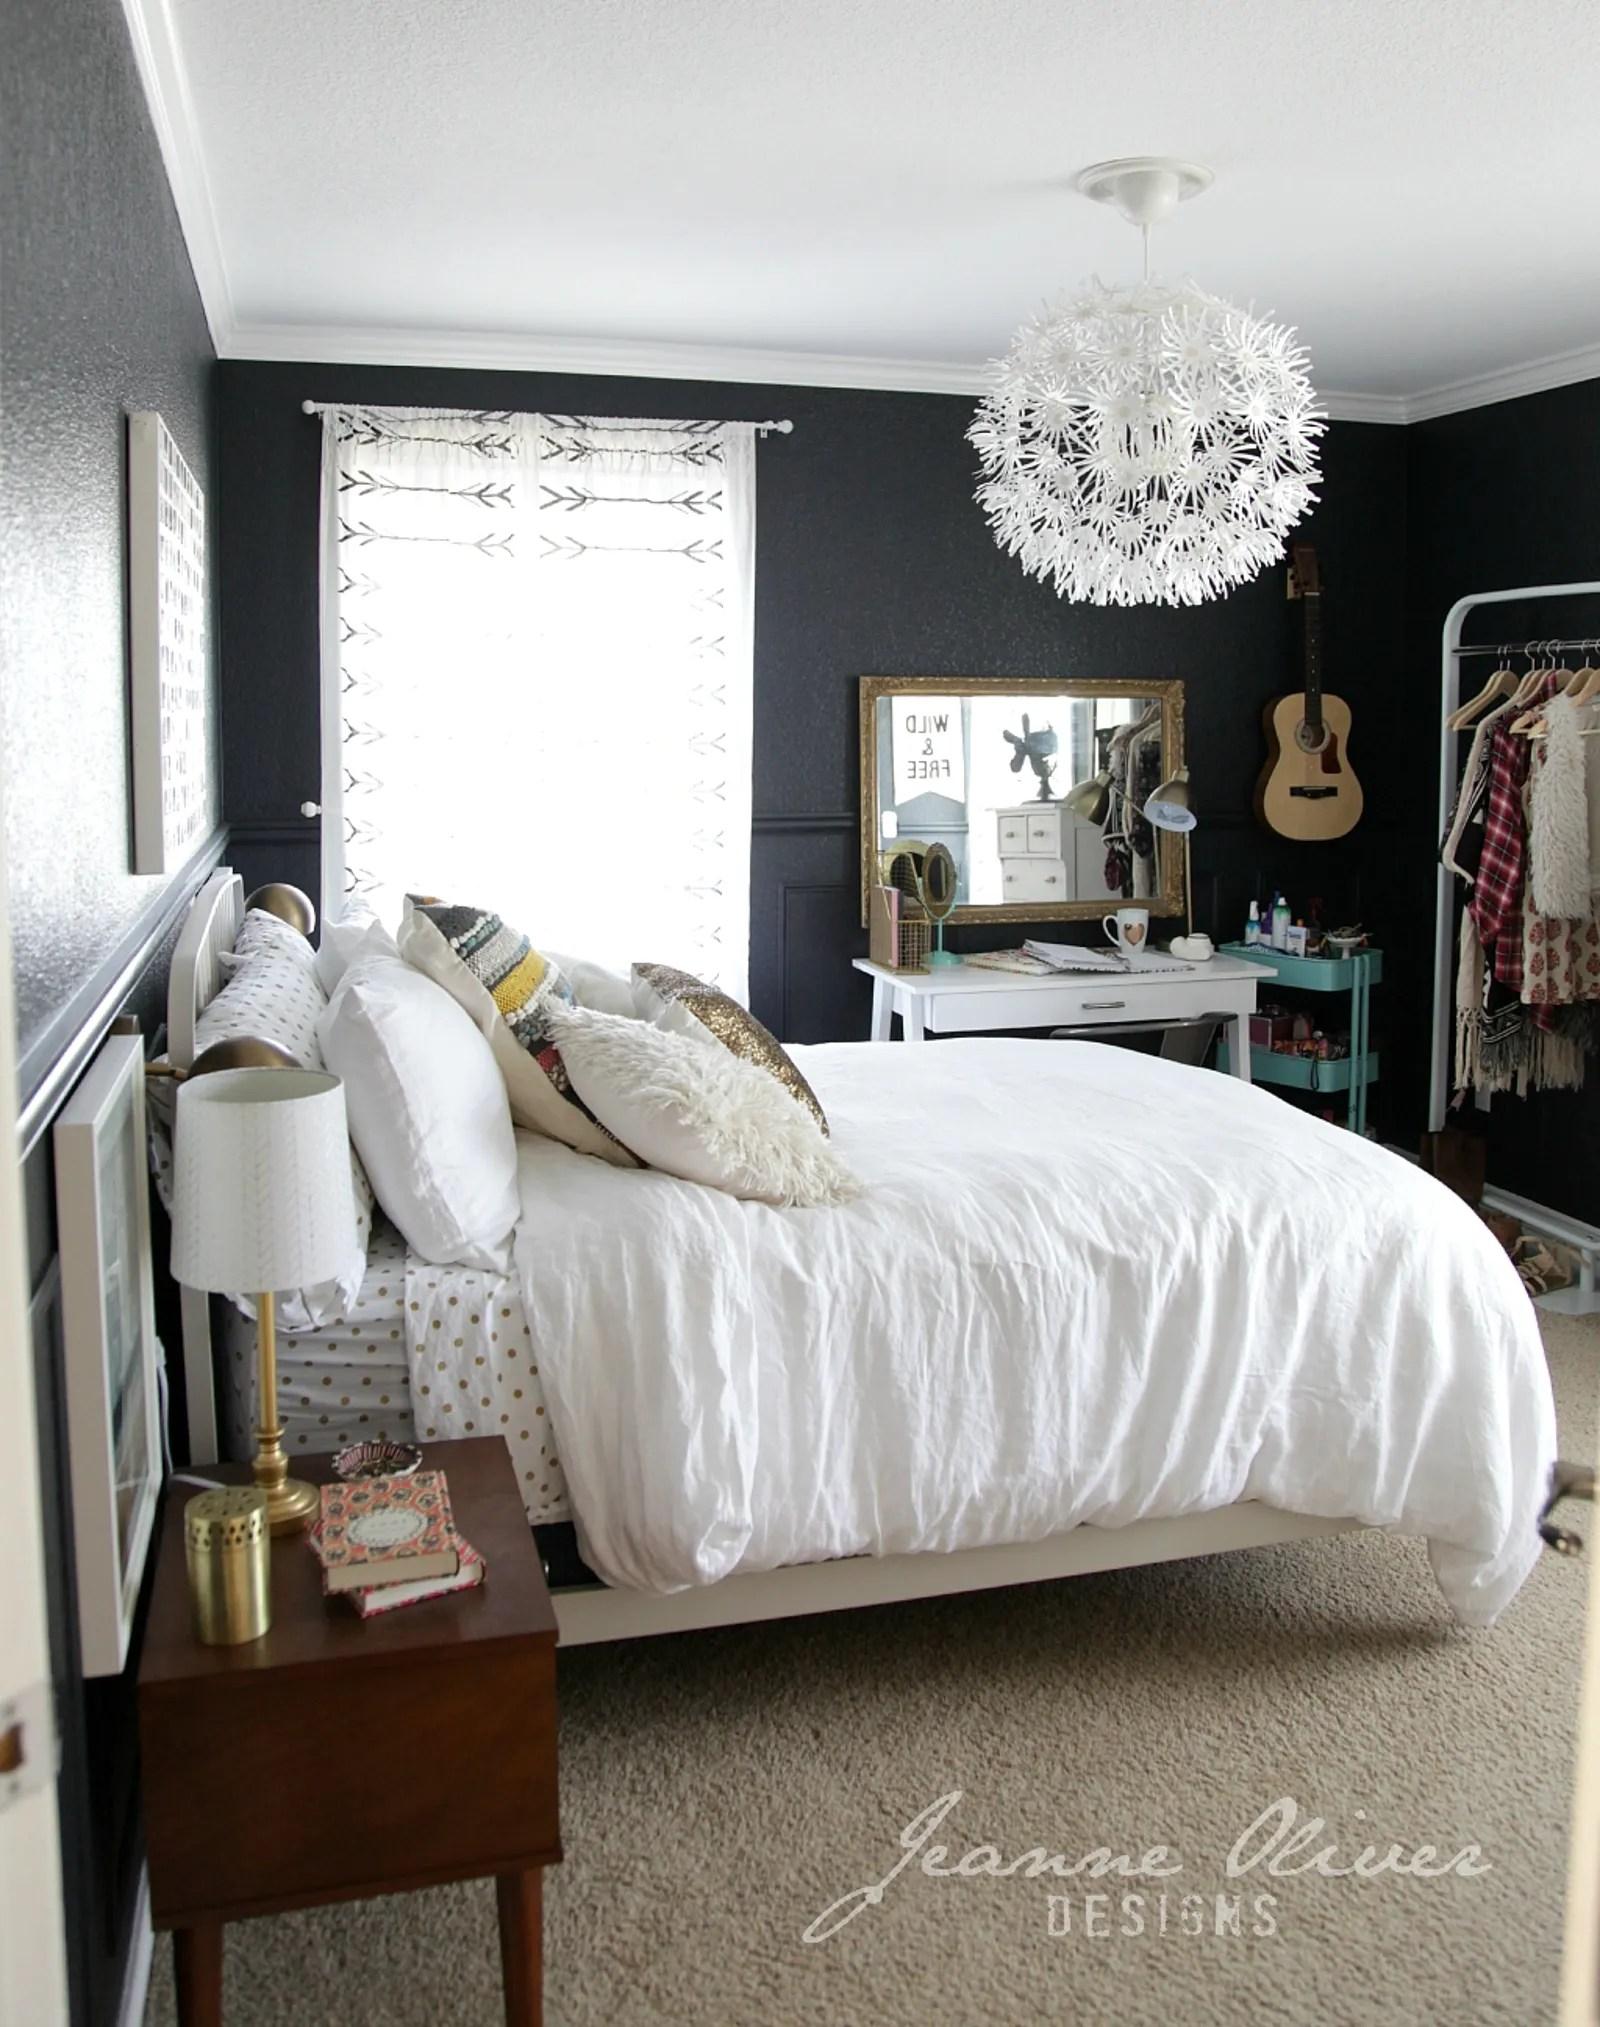 5 Stylish Teen Bedrooms - Teen Vogue on Teenage Bedroom Ideas For Small Rooms  id=57324